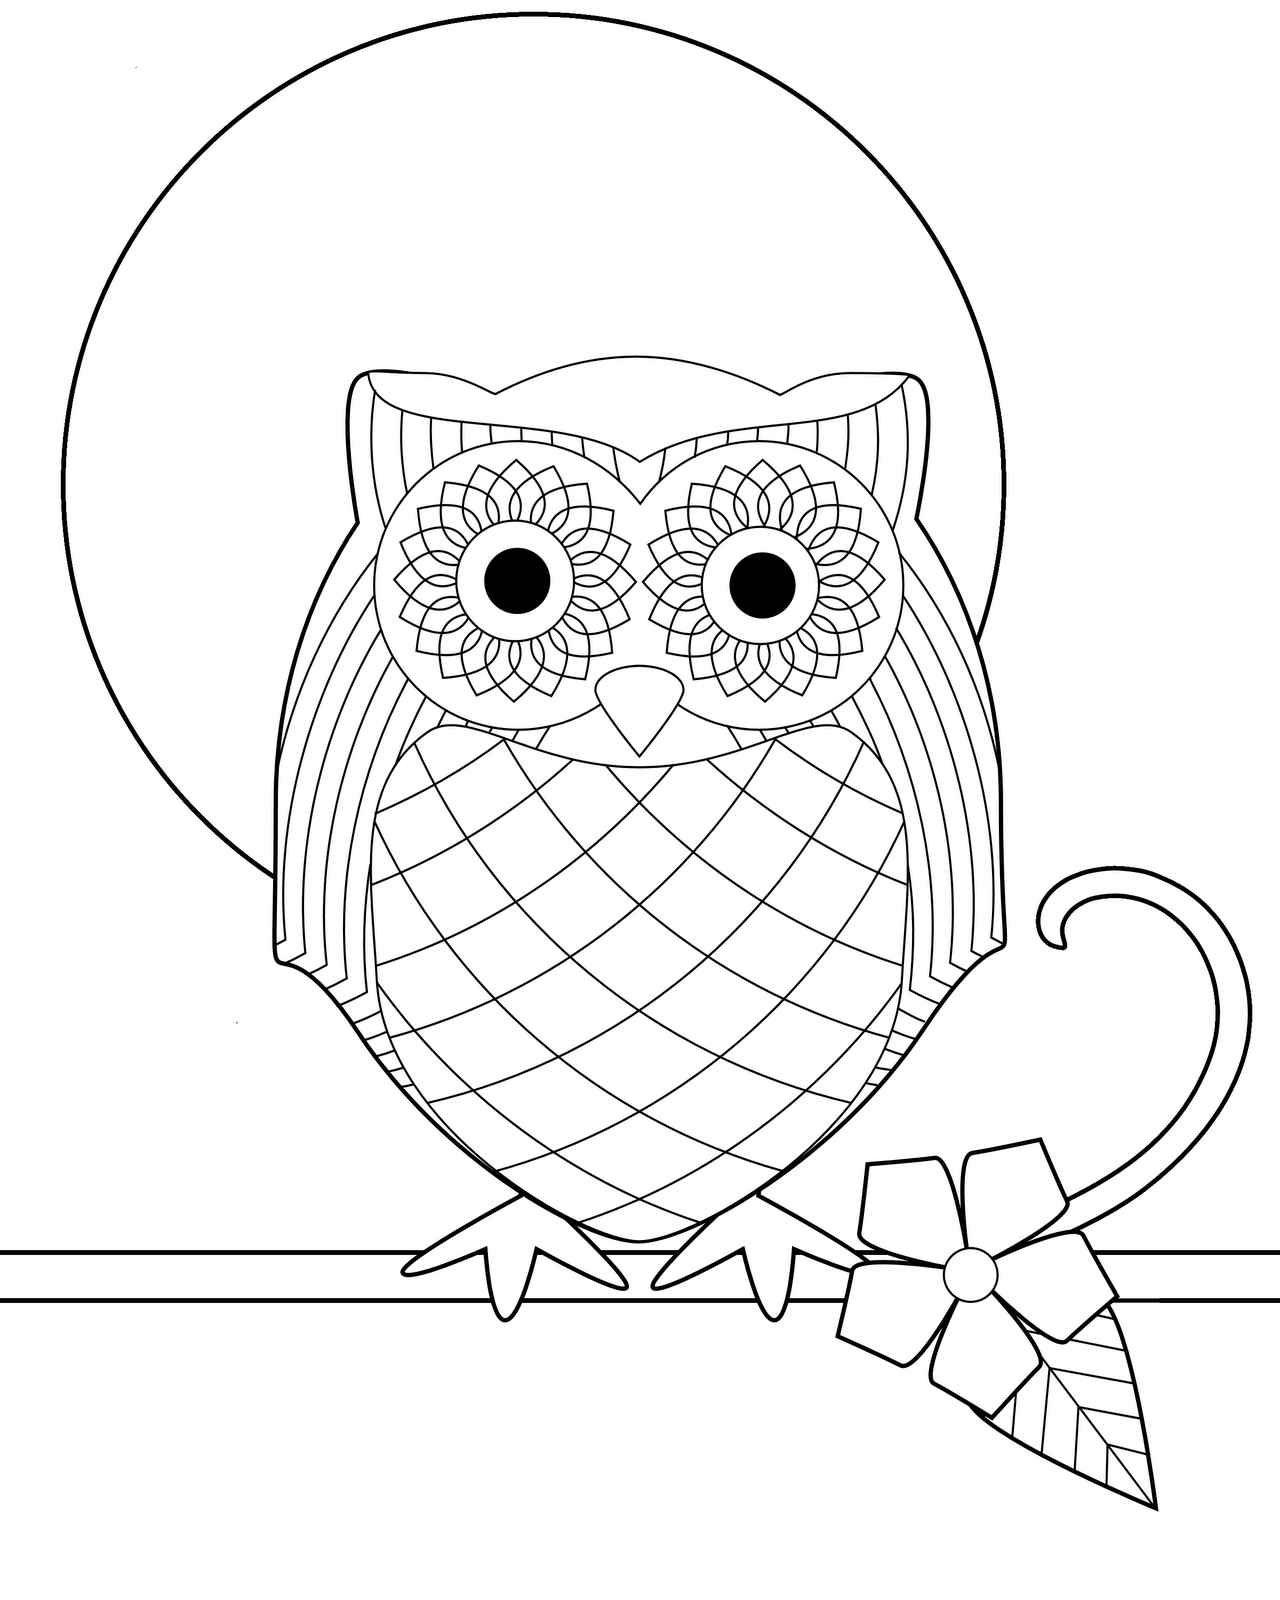 Cute-Coloring-Pages-Of-Owls4.jpg (1280×1600) | Színezők - Coloring ...